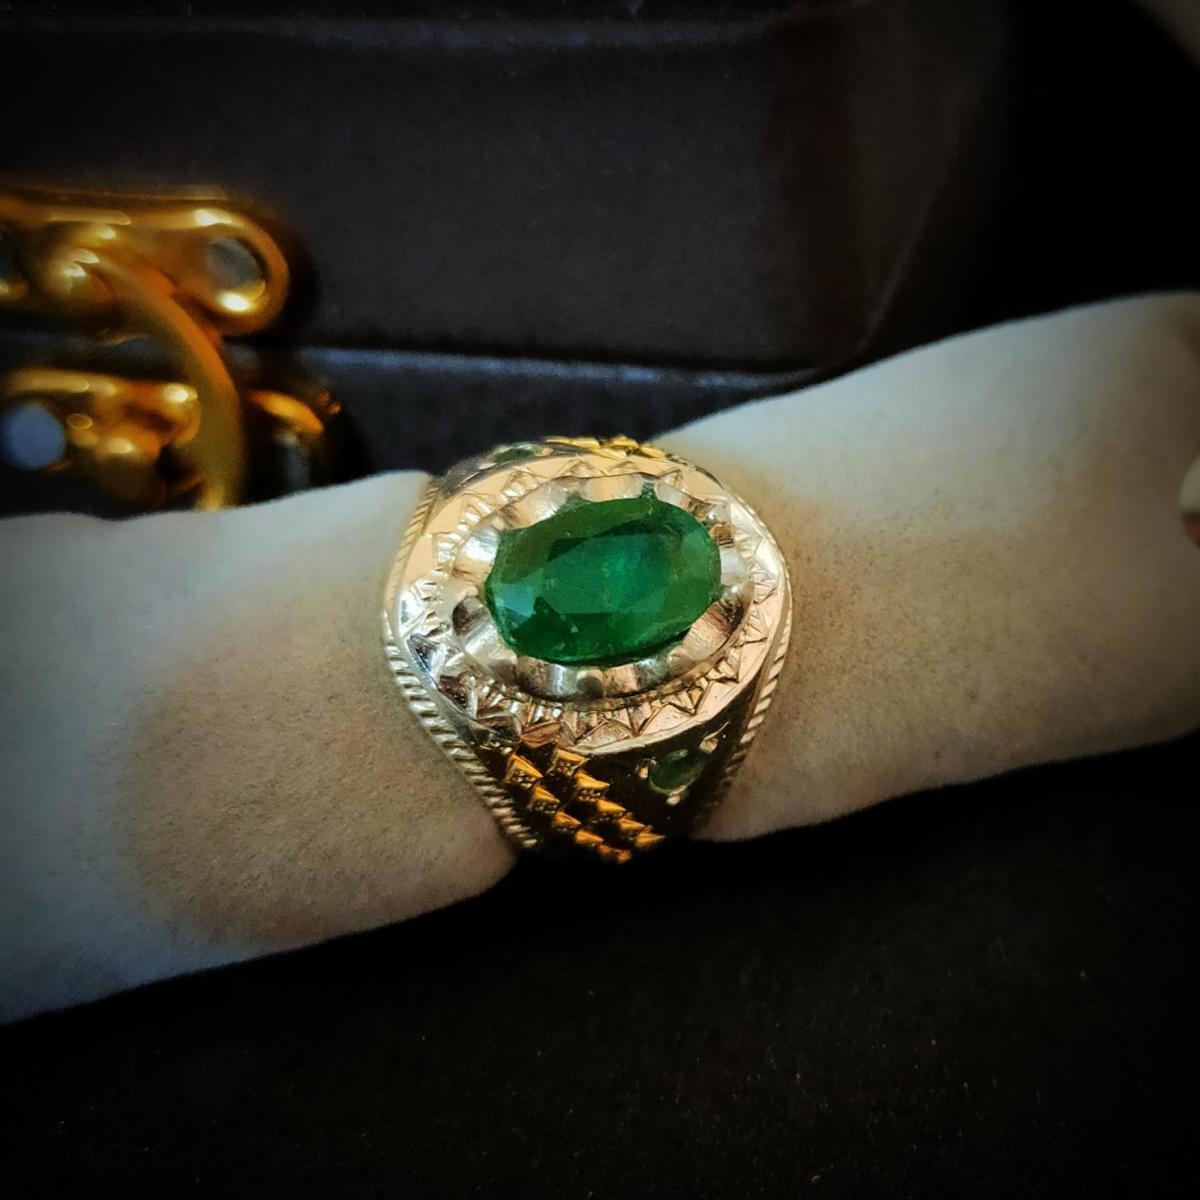 Natural Emerald Ring Handmade 925 Silver Zambian Emerald Zamurd Ring 8 natural gemstones pakistan + 925 silver jewelry online